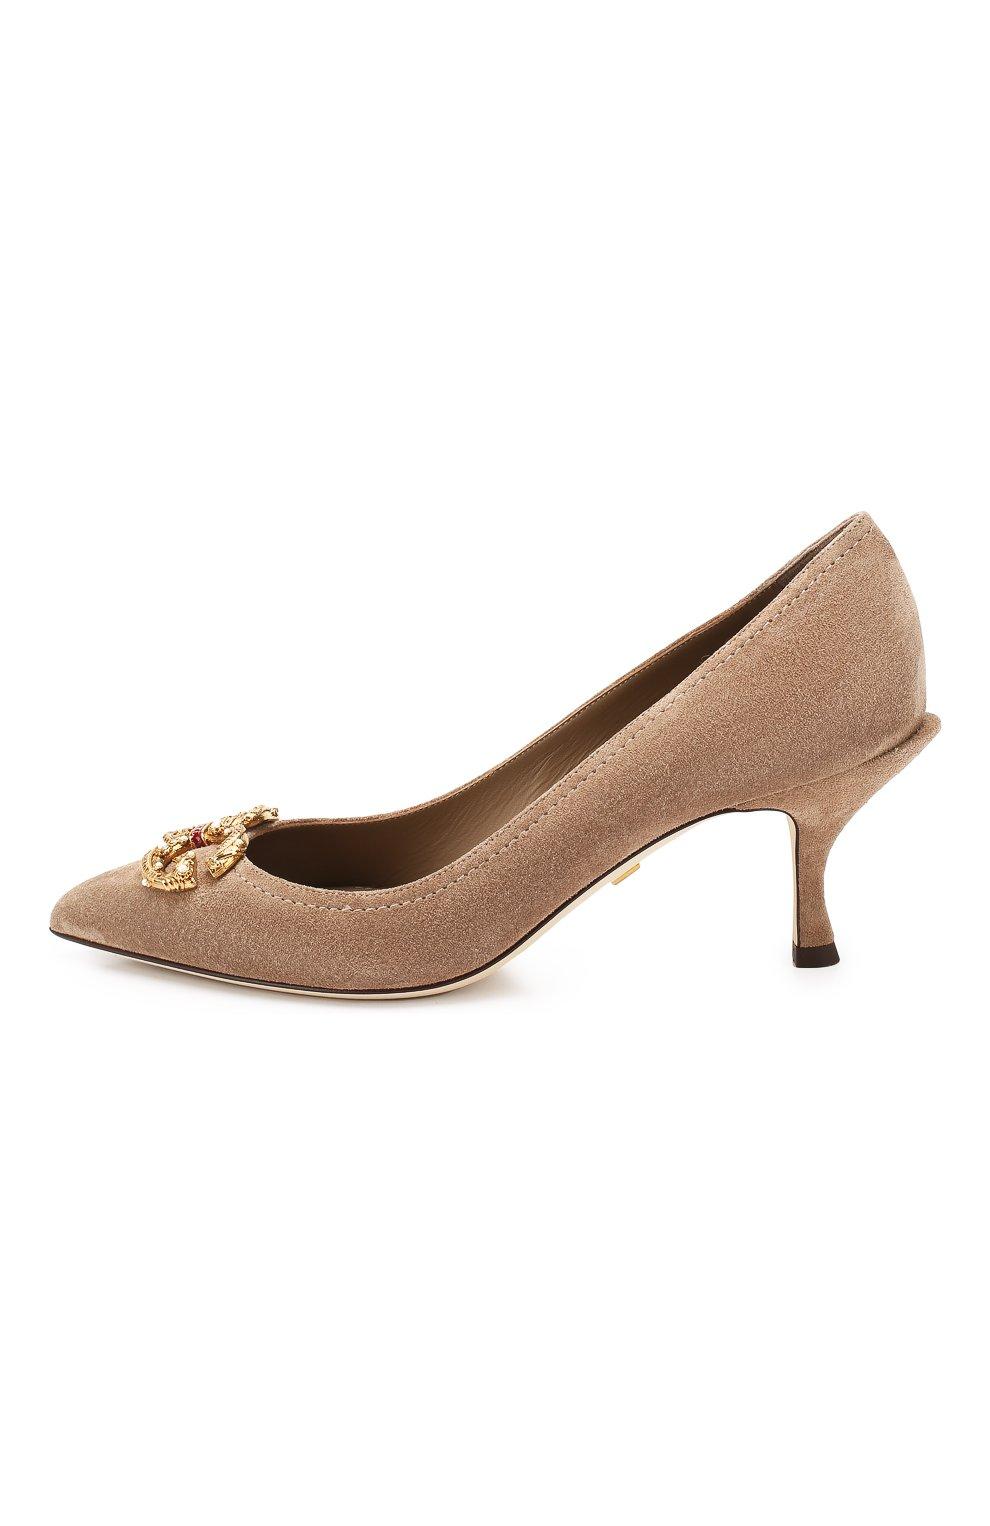 Замшевые туфли Lori | Фото №3